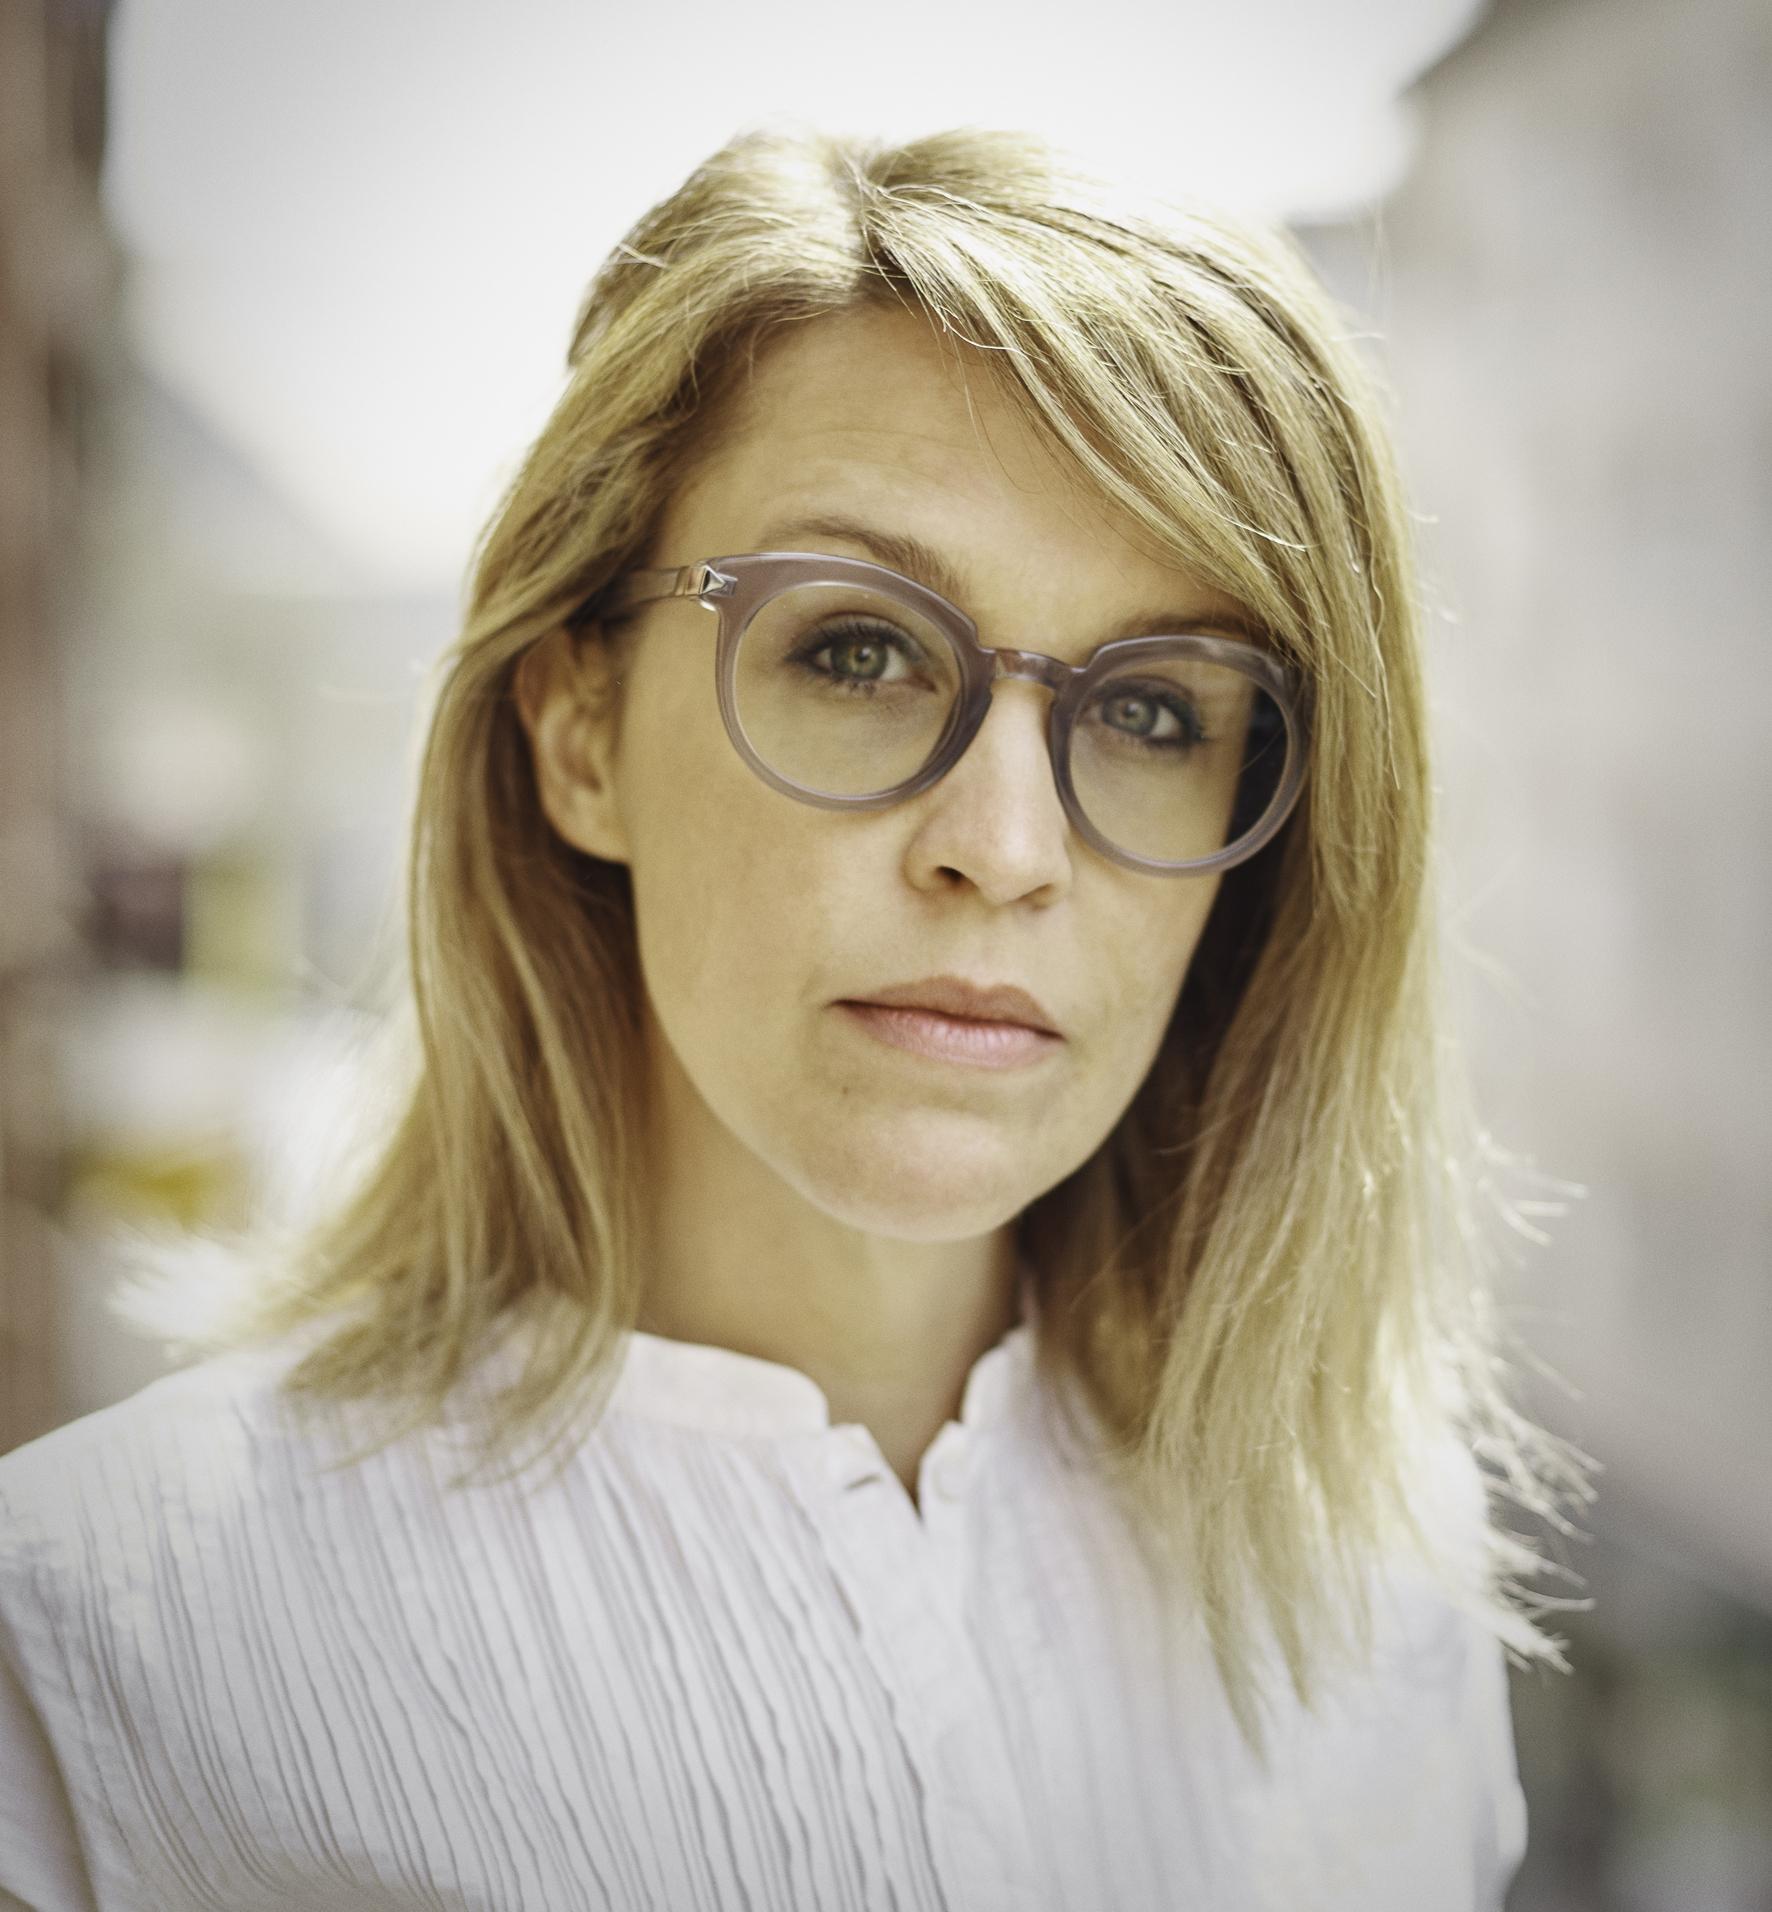 AdrianneJoergensen-profile-TobiasWootton2017_15x20@300.jpg